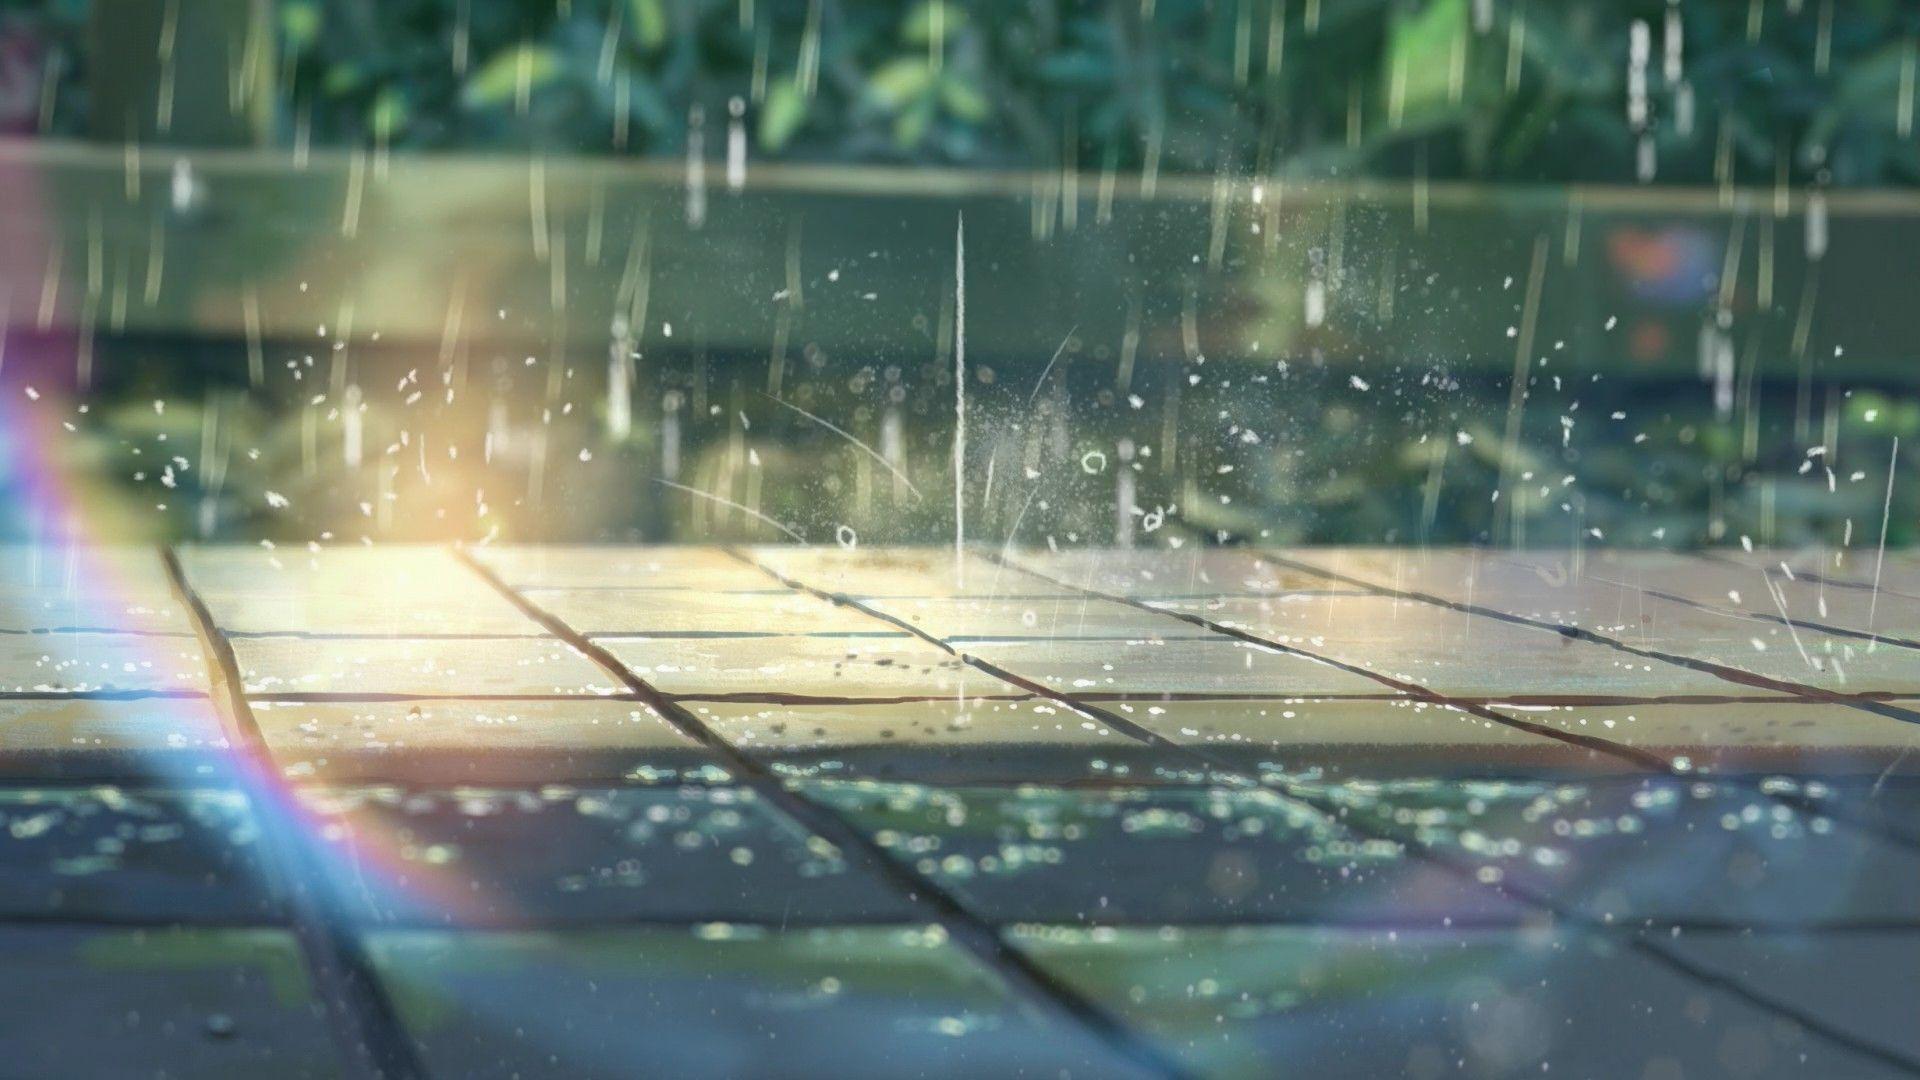 Sunlight Window Water Reflection Rain Green Glass Hd